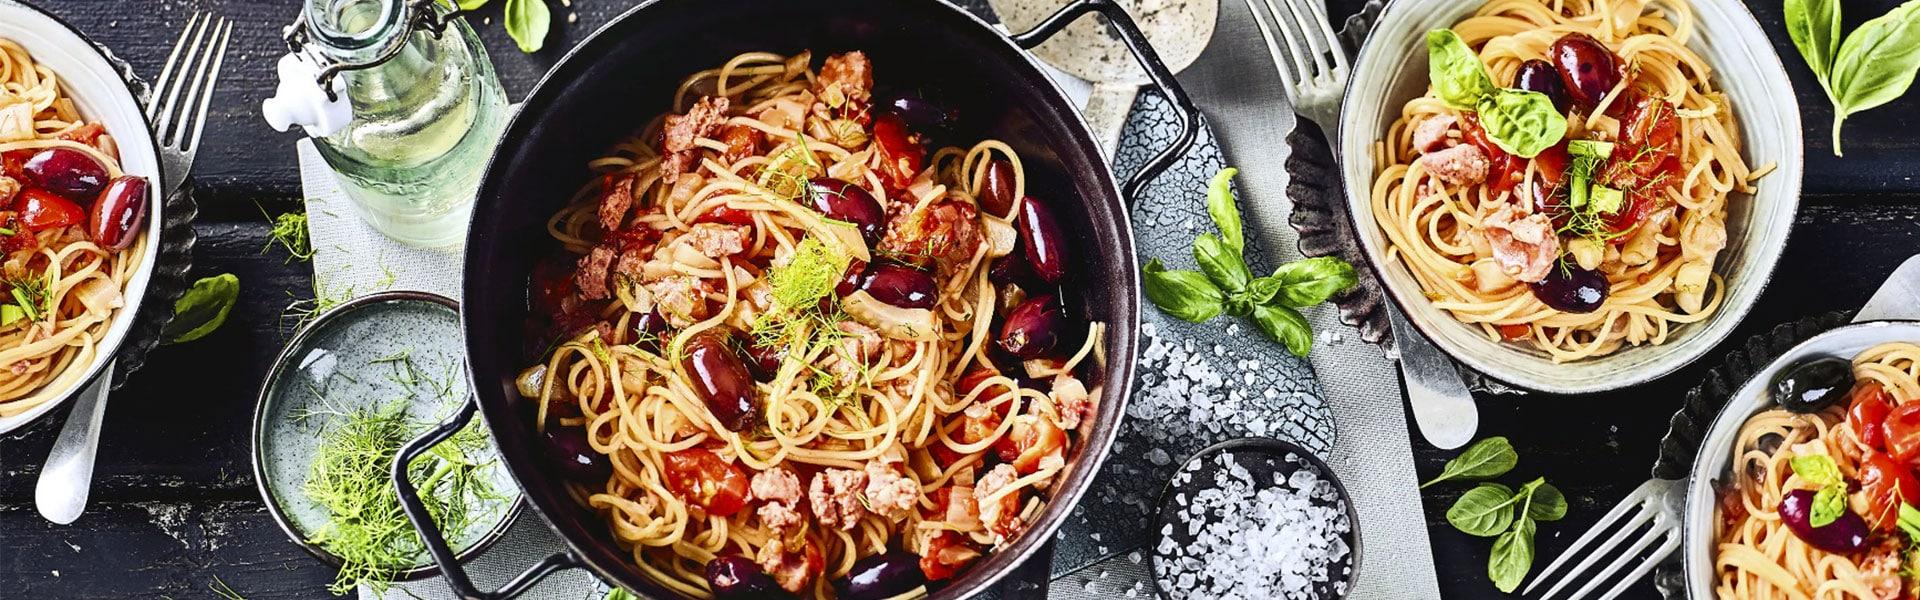 One Pot Spaghetti mit Fenchel und Salsiccia